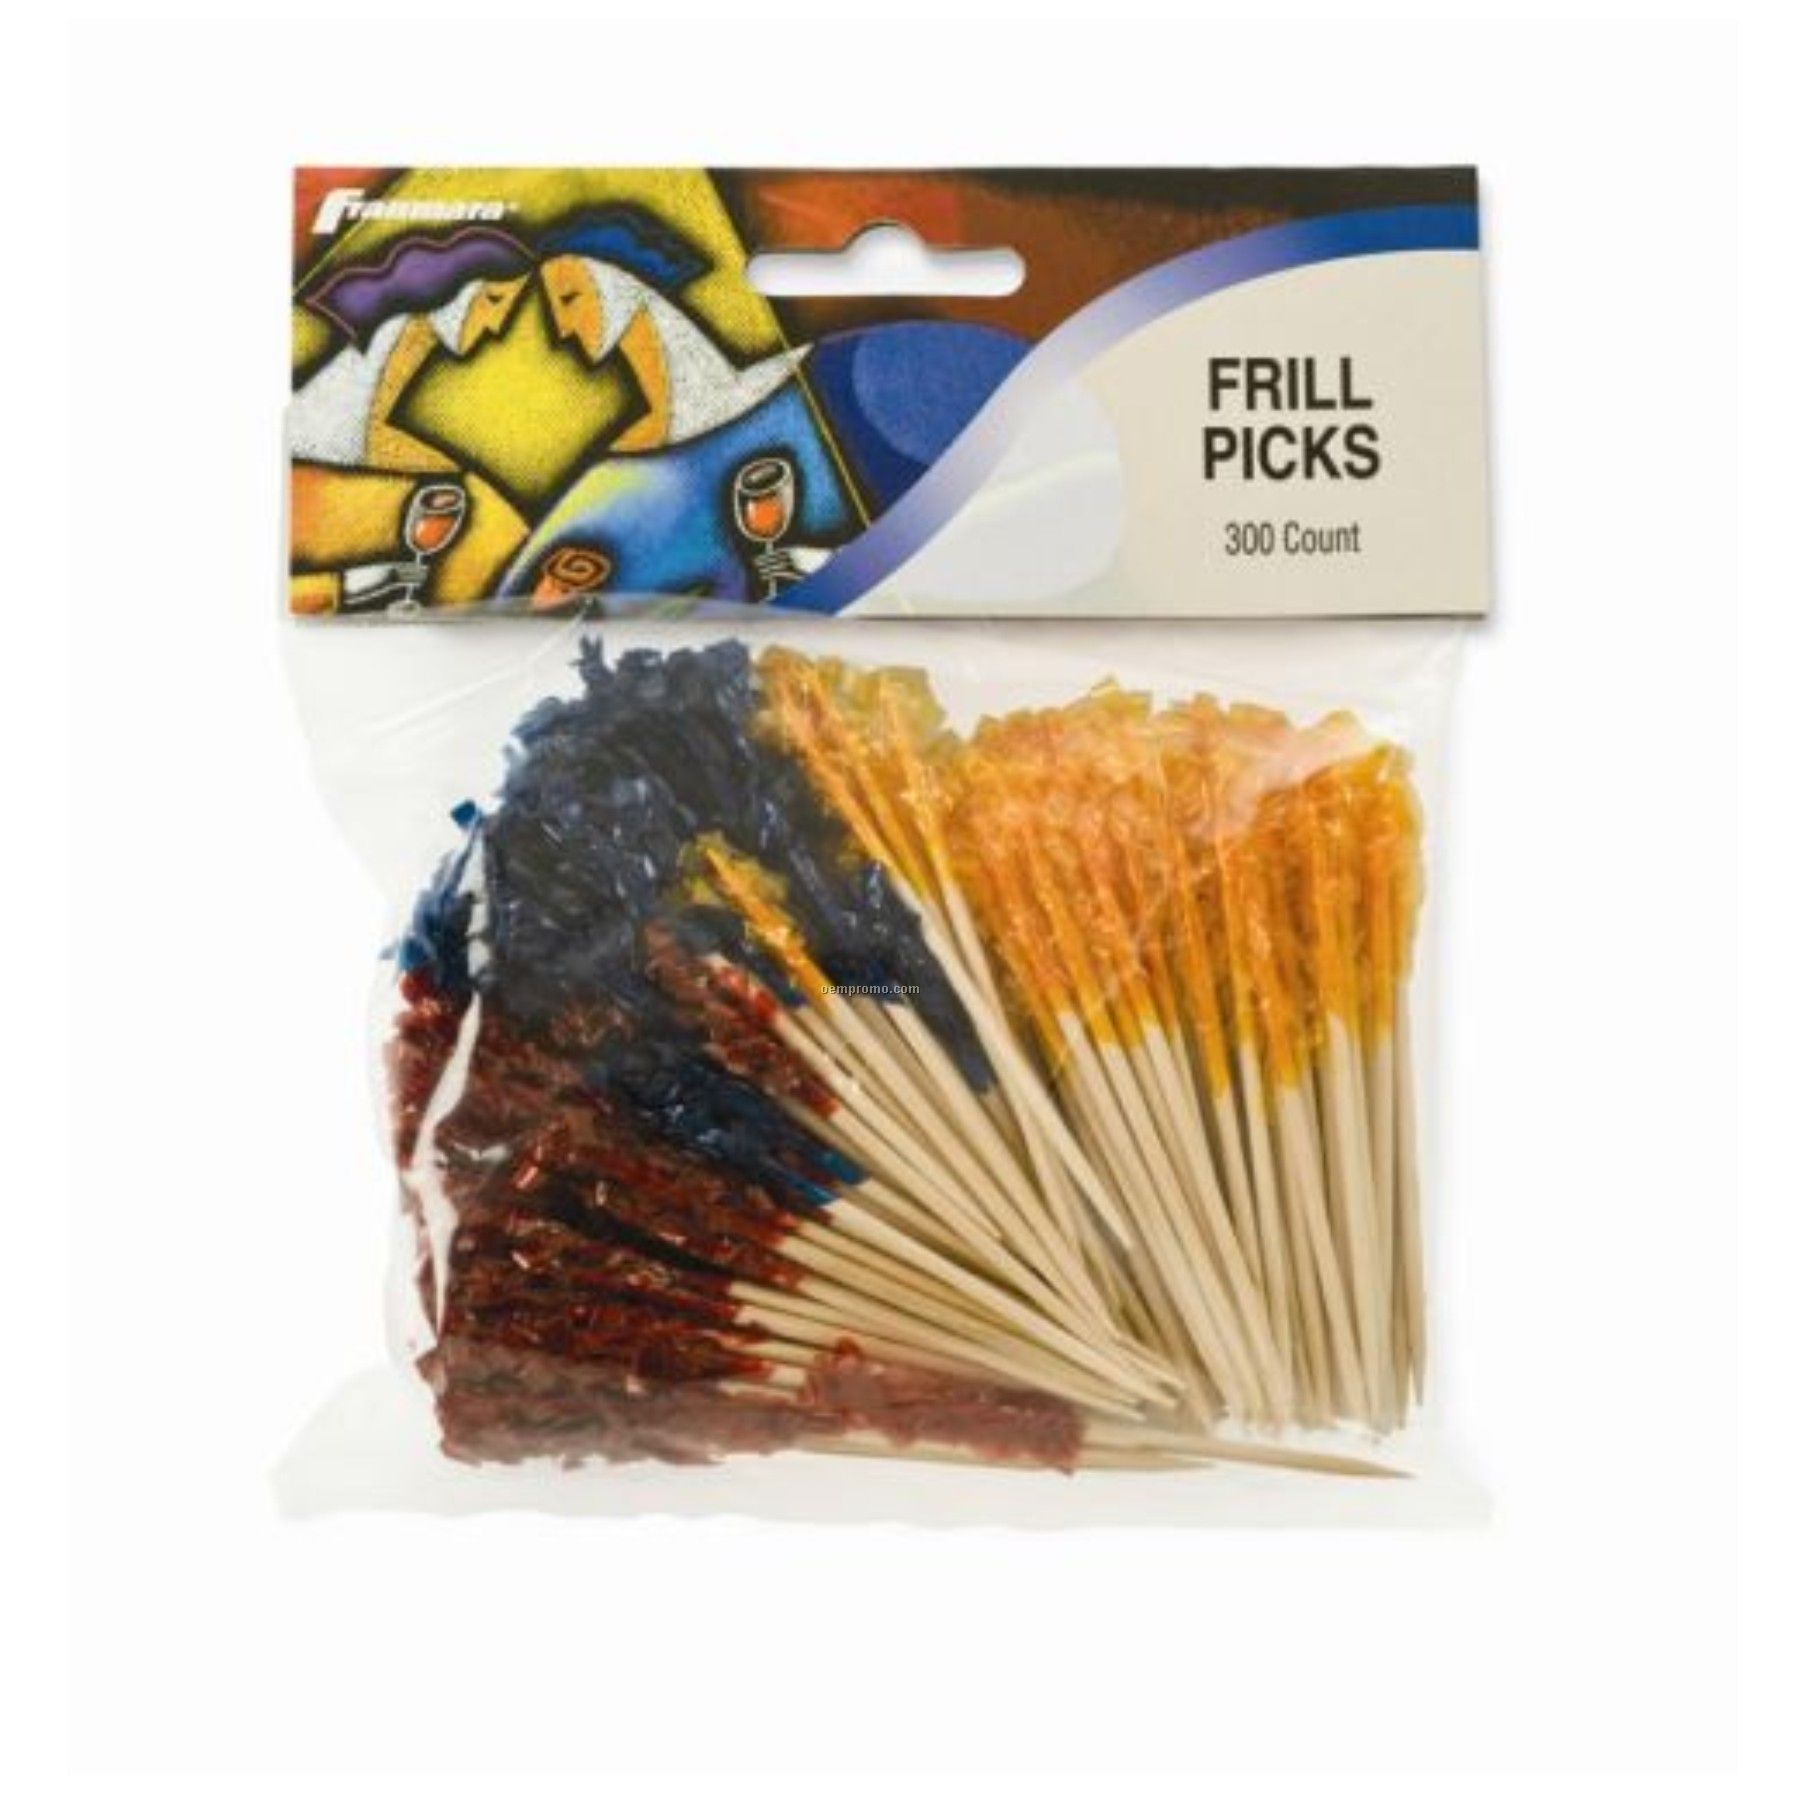 Frill Picks (300 Count)